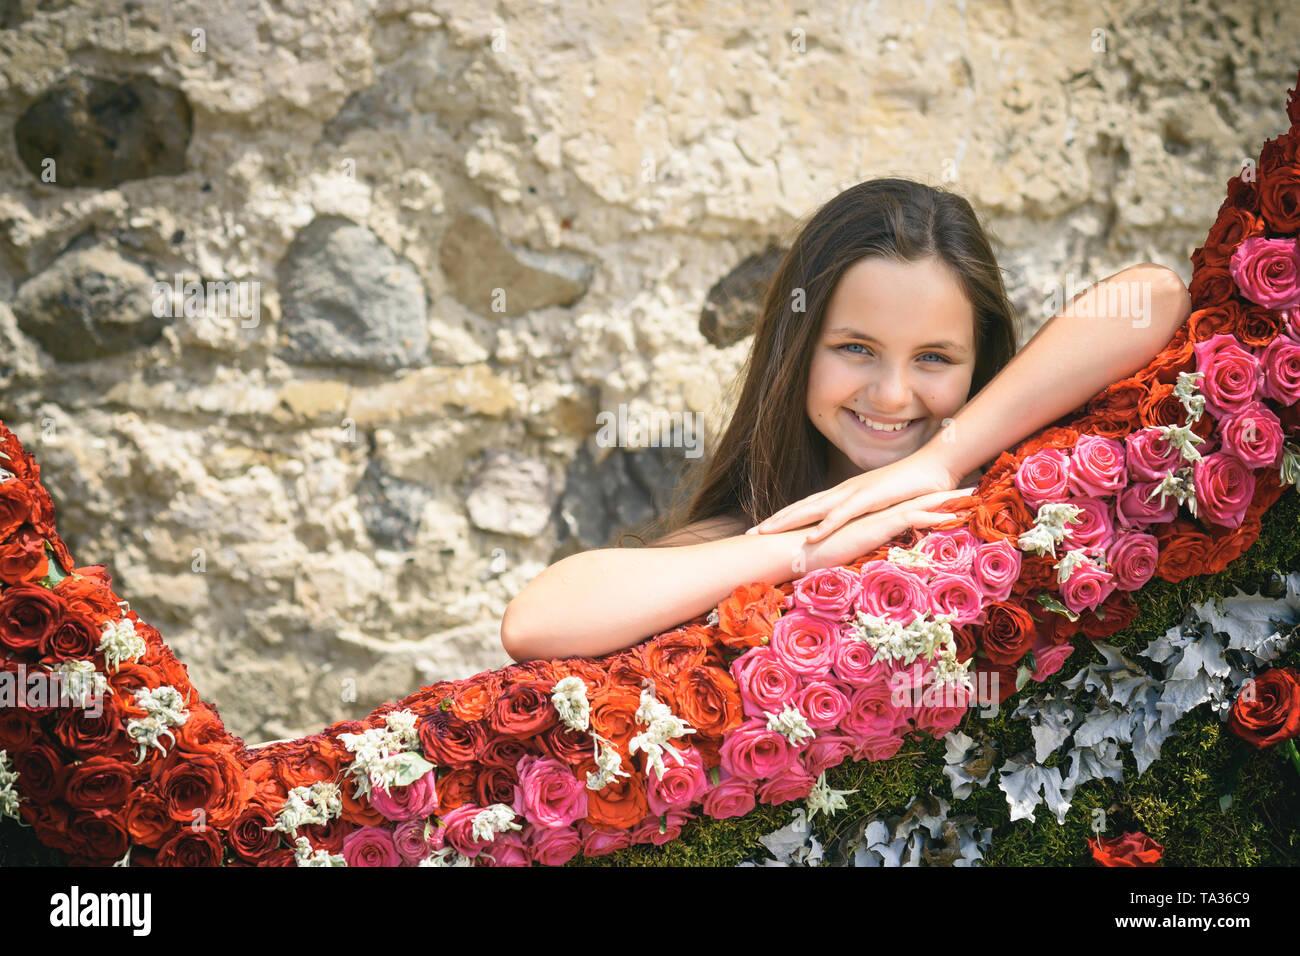 Floral design and little child, floristic, floral shop - Stock Image